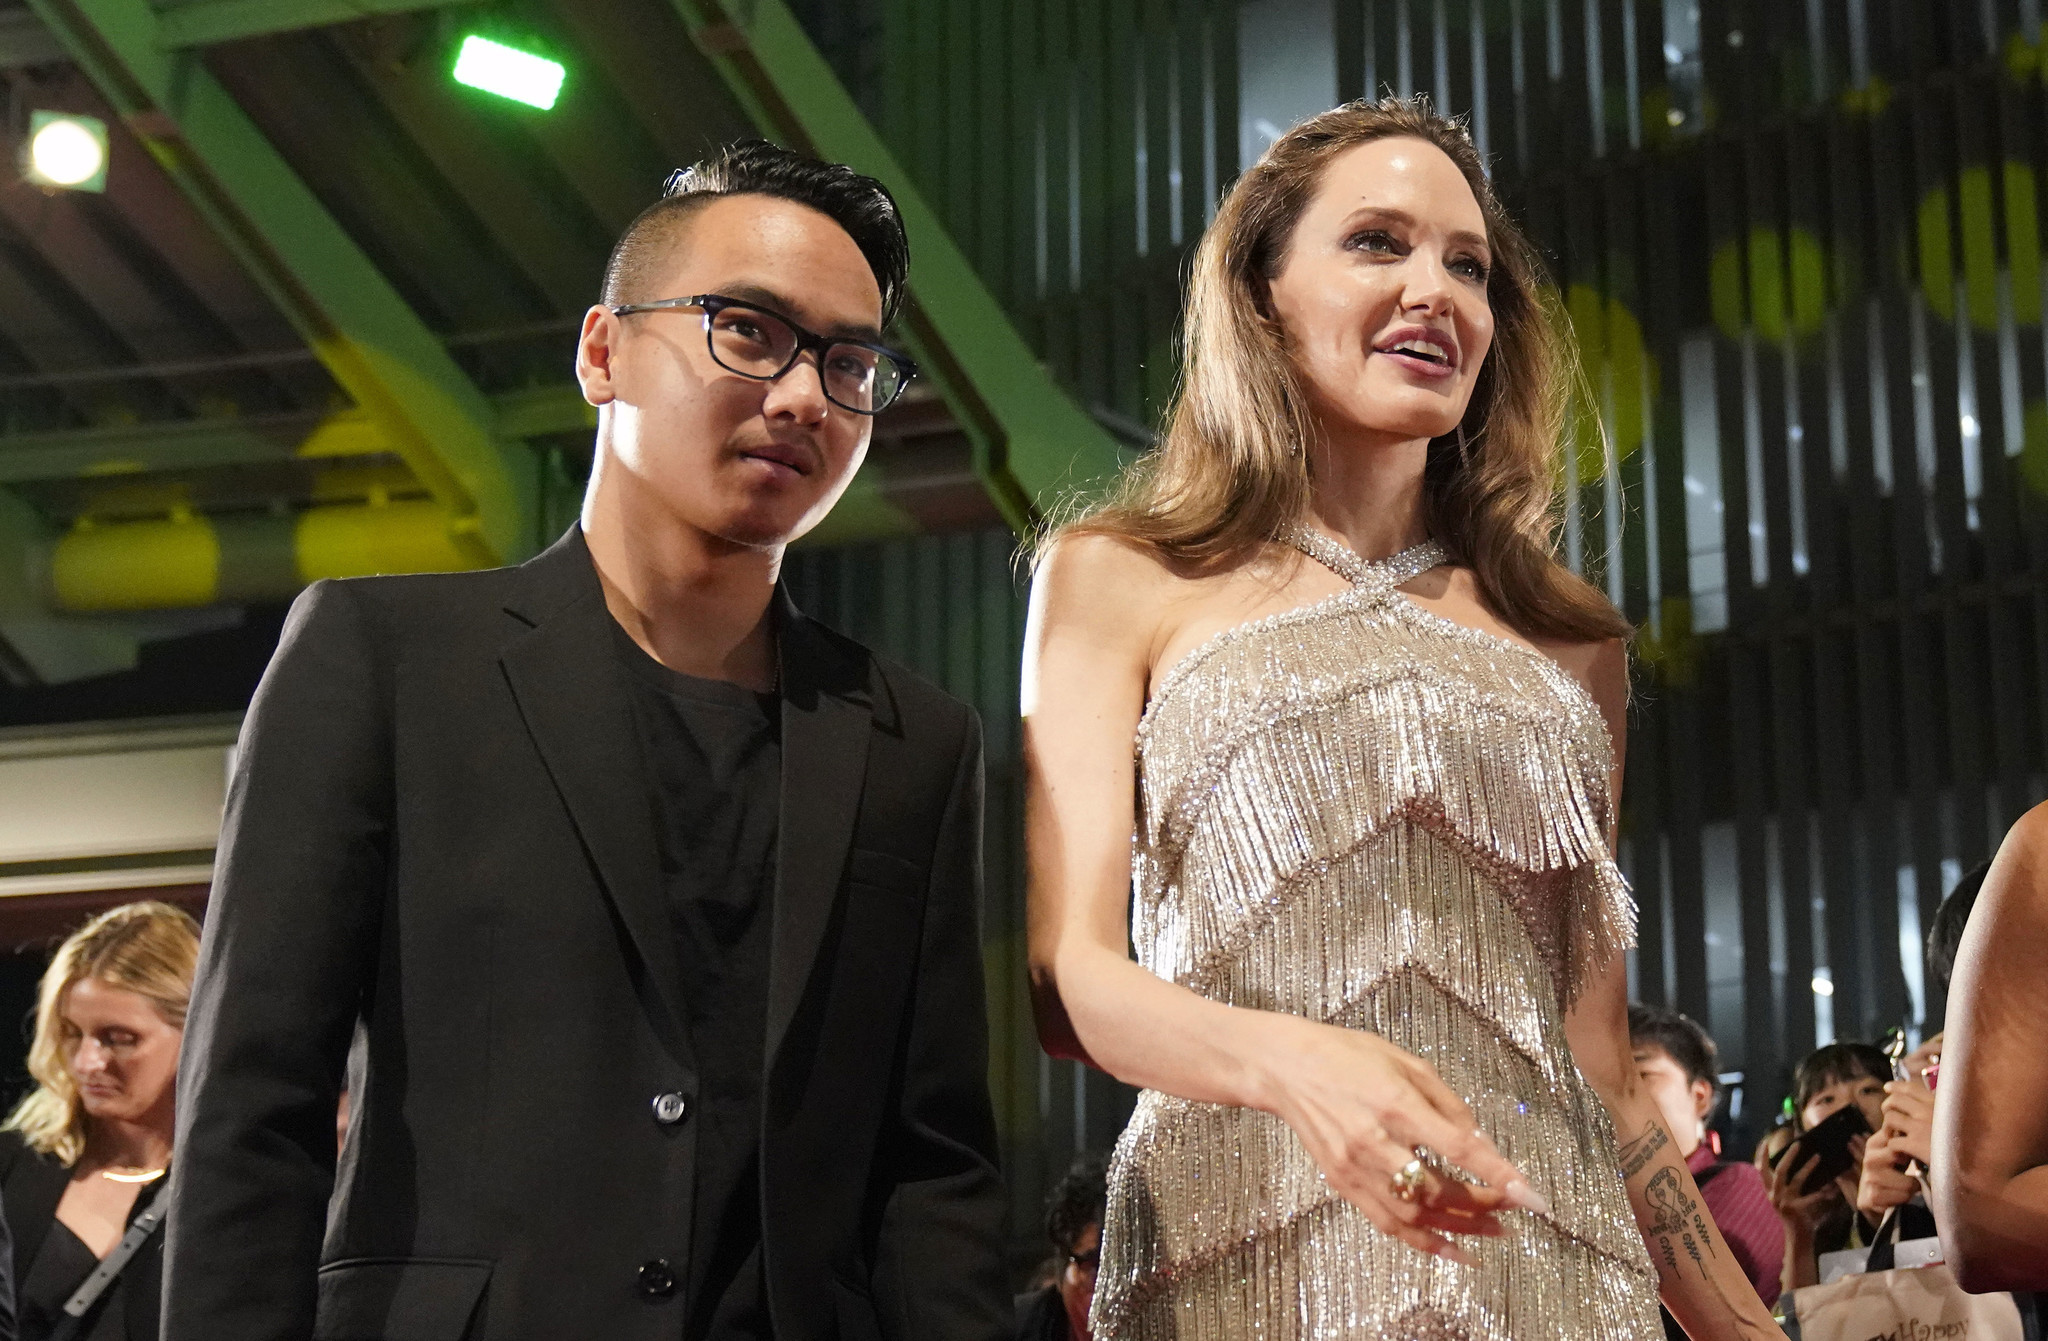 Angelina Jolie's son Maddox home from college in South Korea amid coronavirus